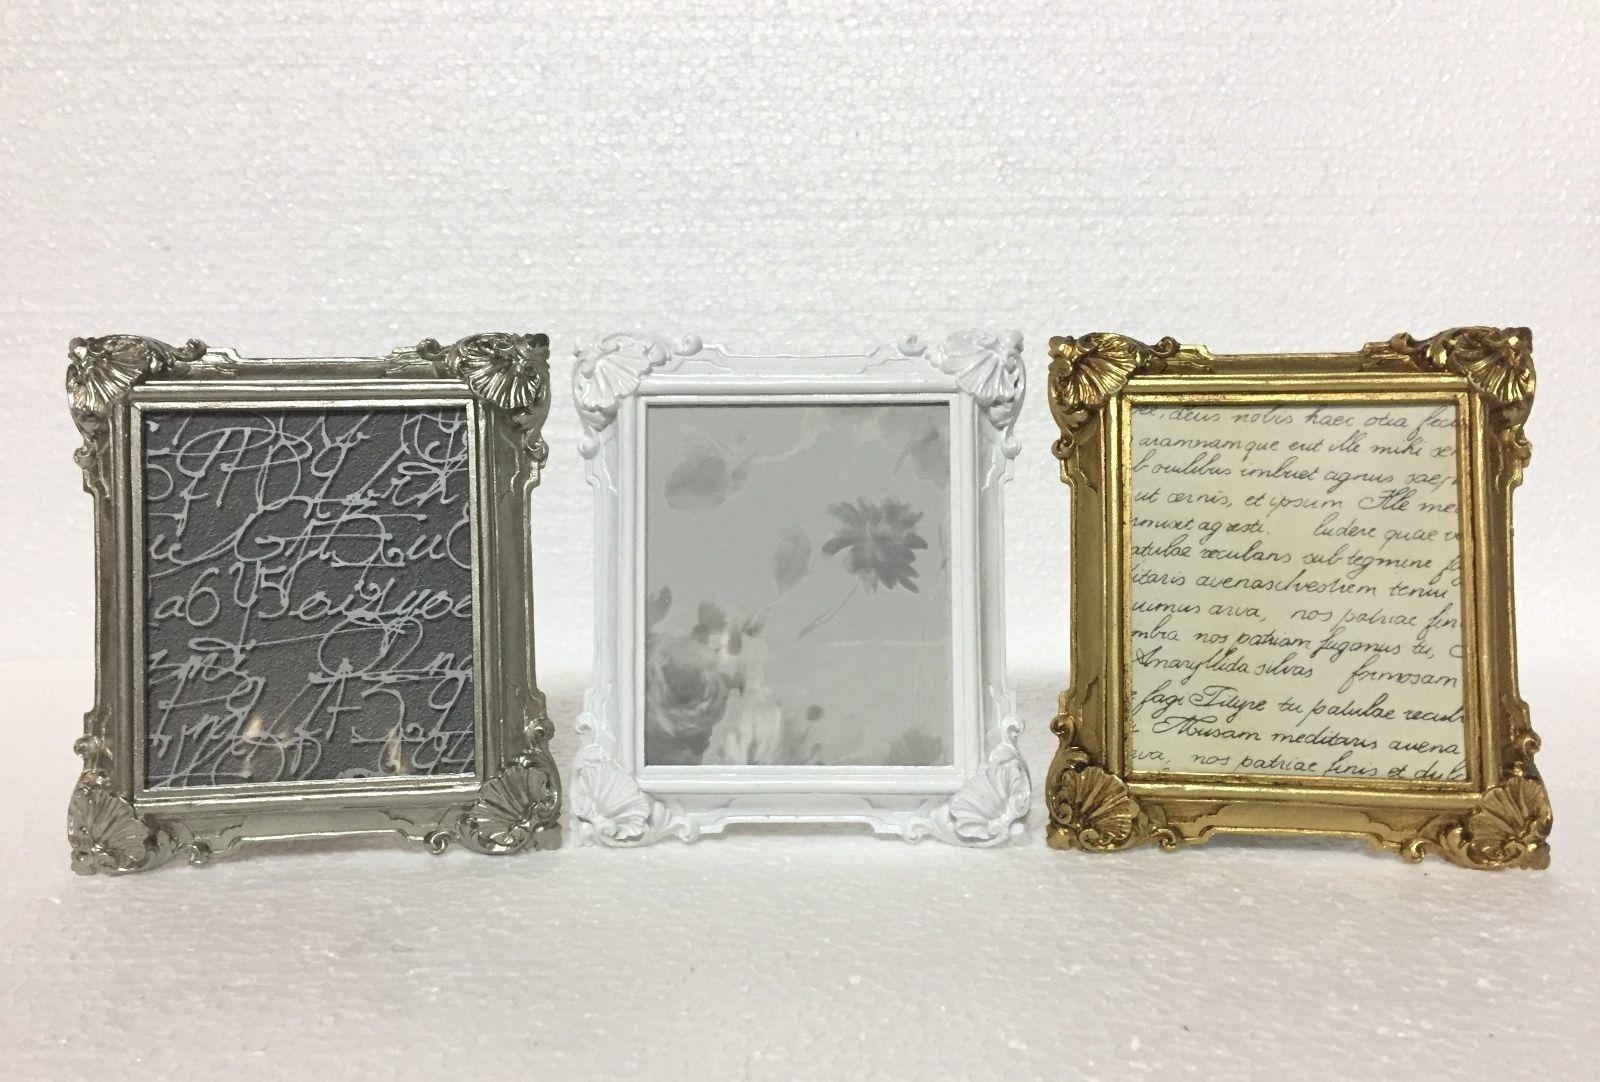 Bilderrahmen Antik Silber Rechteckig Antik Barockrahmen Fotorahmen ...